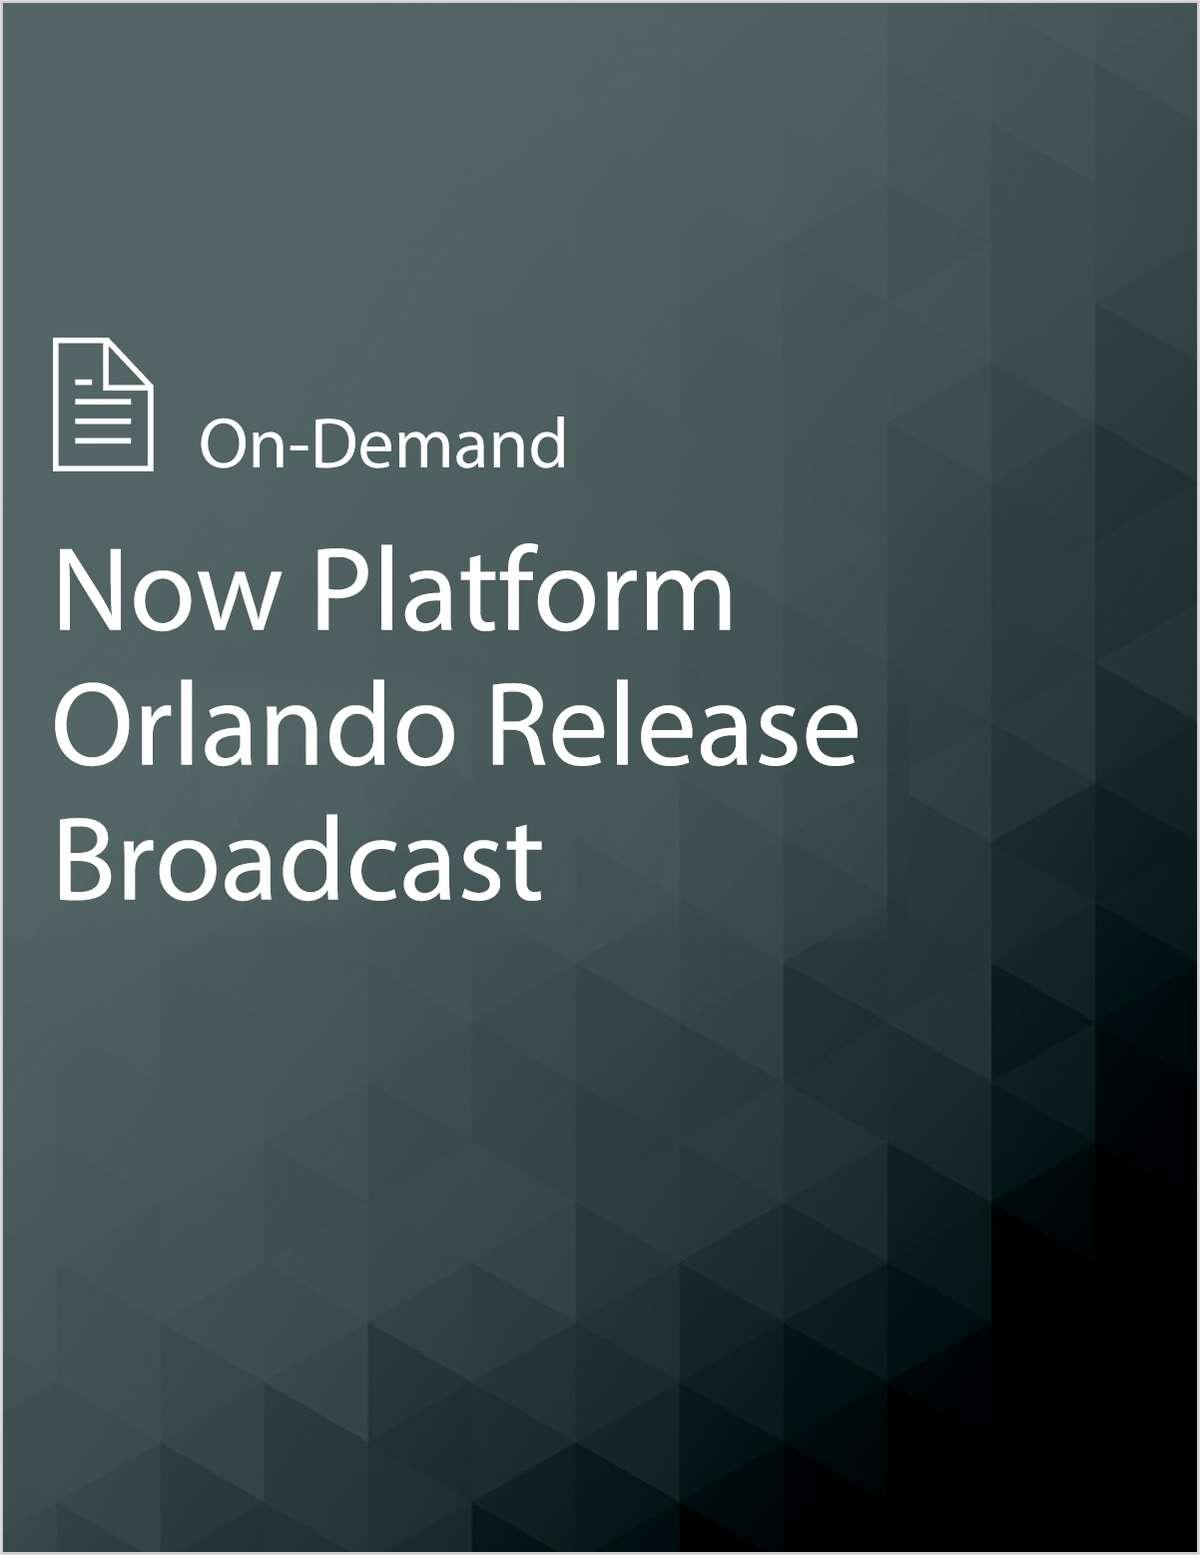 Now Platform Orlando Release Broadcast